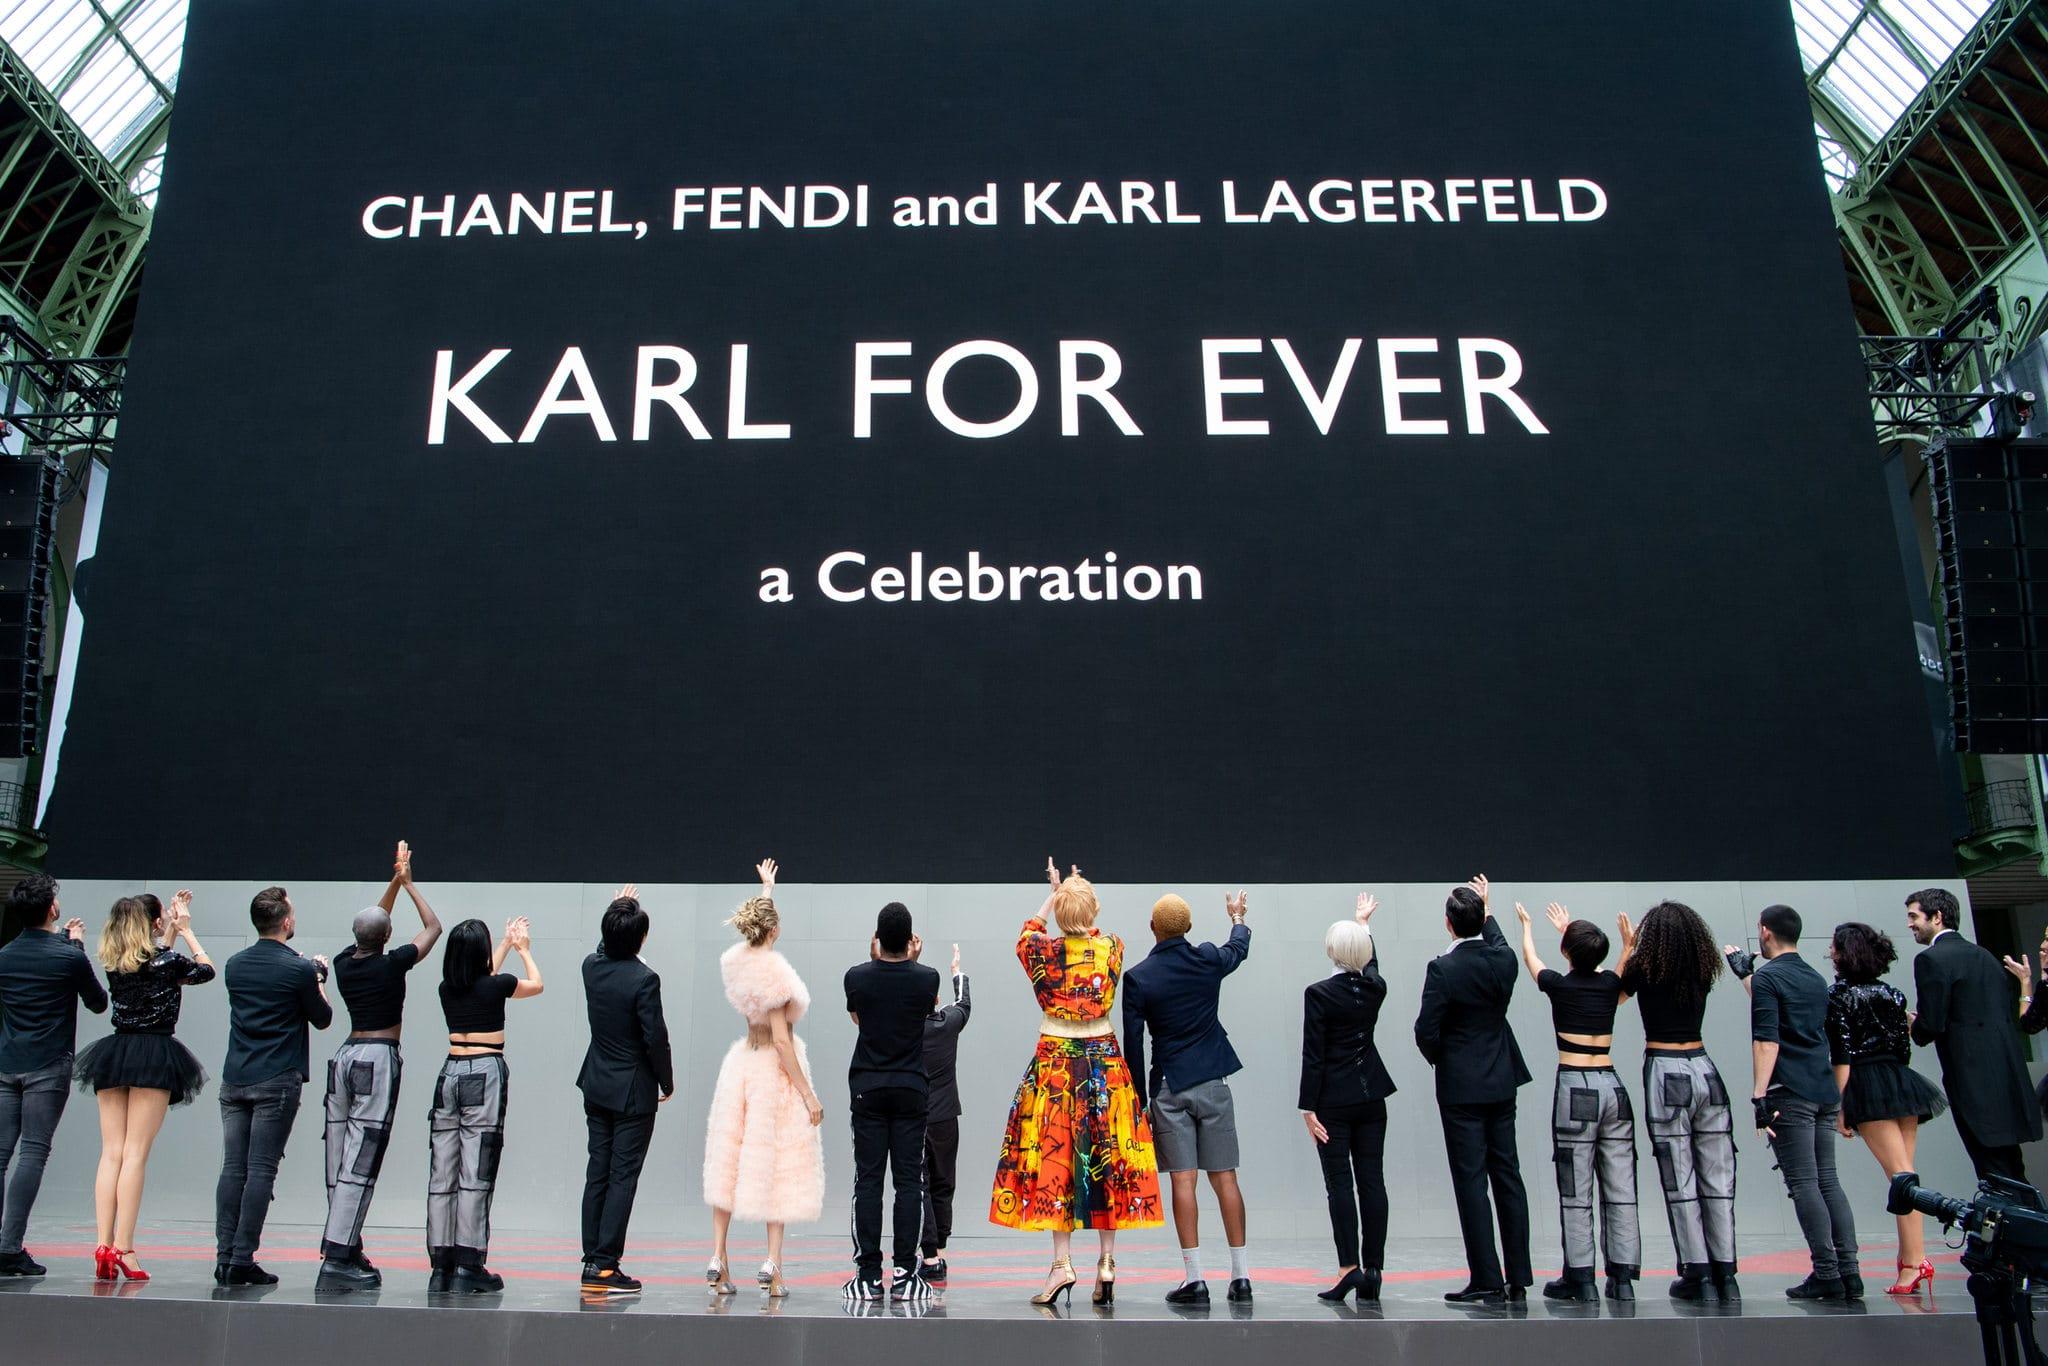 Karl For Ever: Paris hosts Karl Lagerfeld memorial